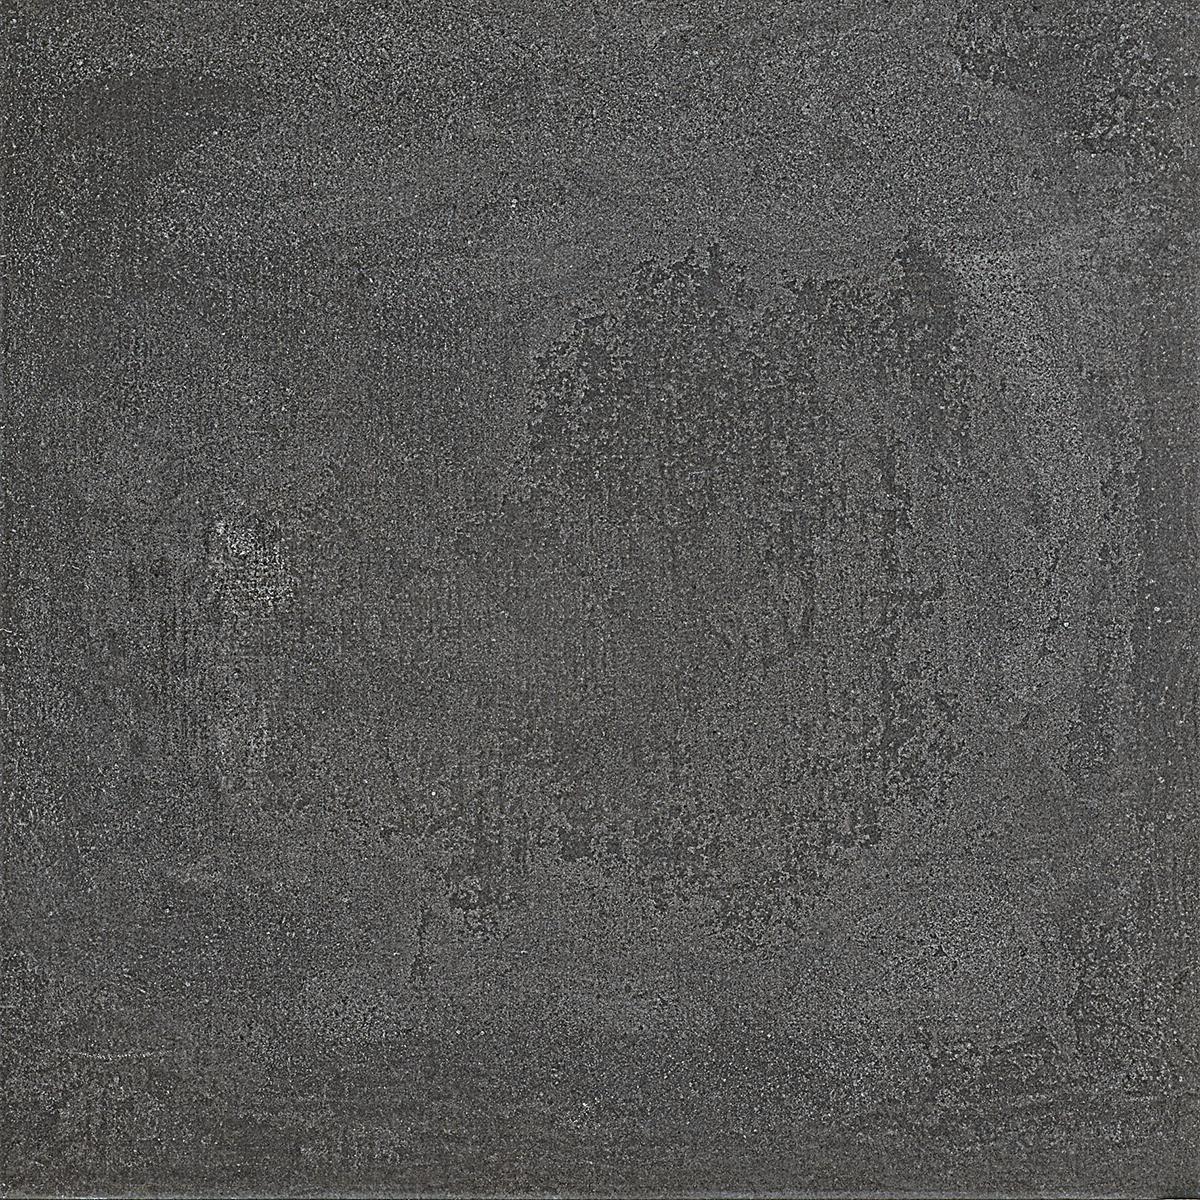 Carrelage Rennes Anthracite 60x60cm